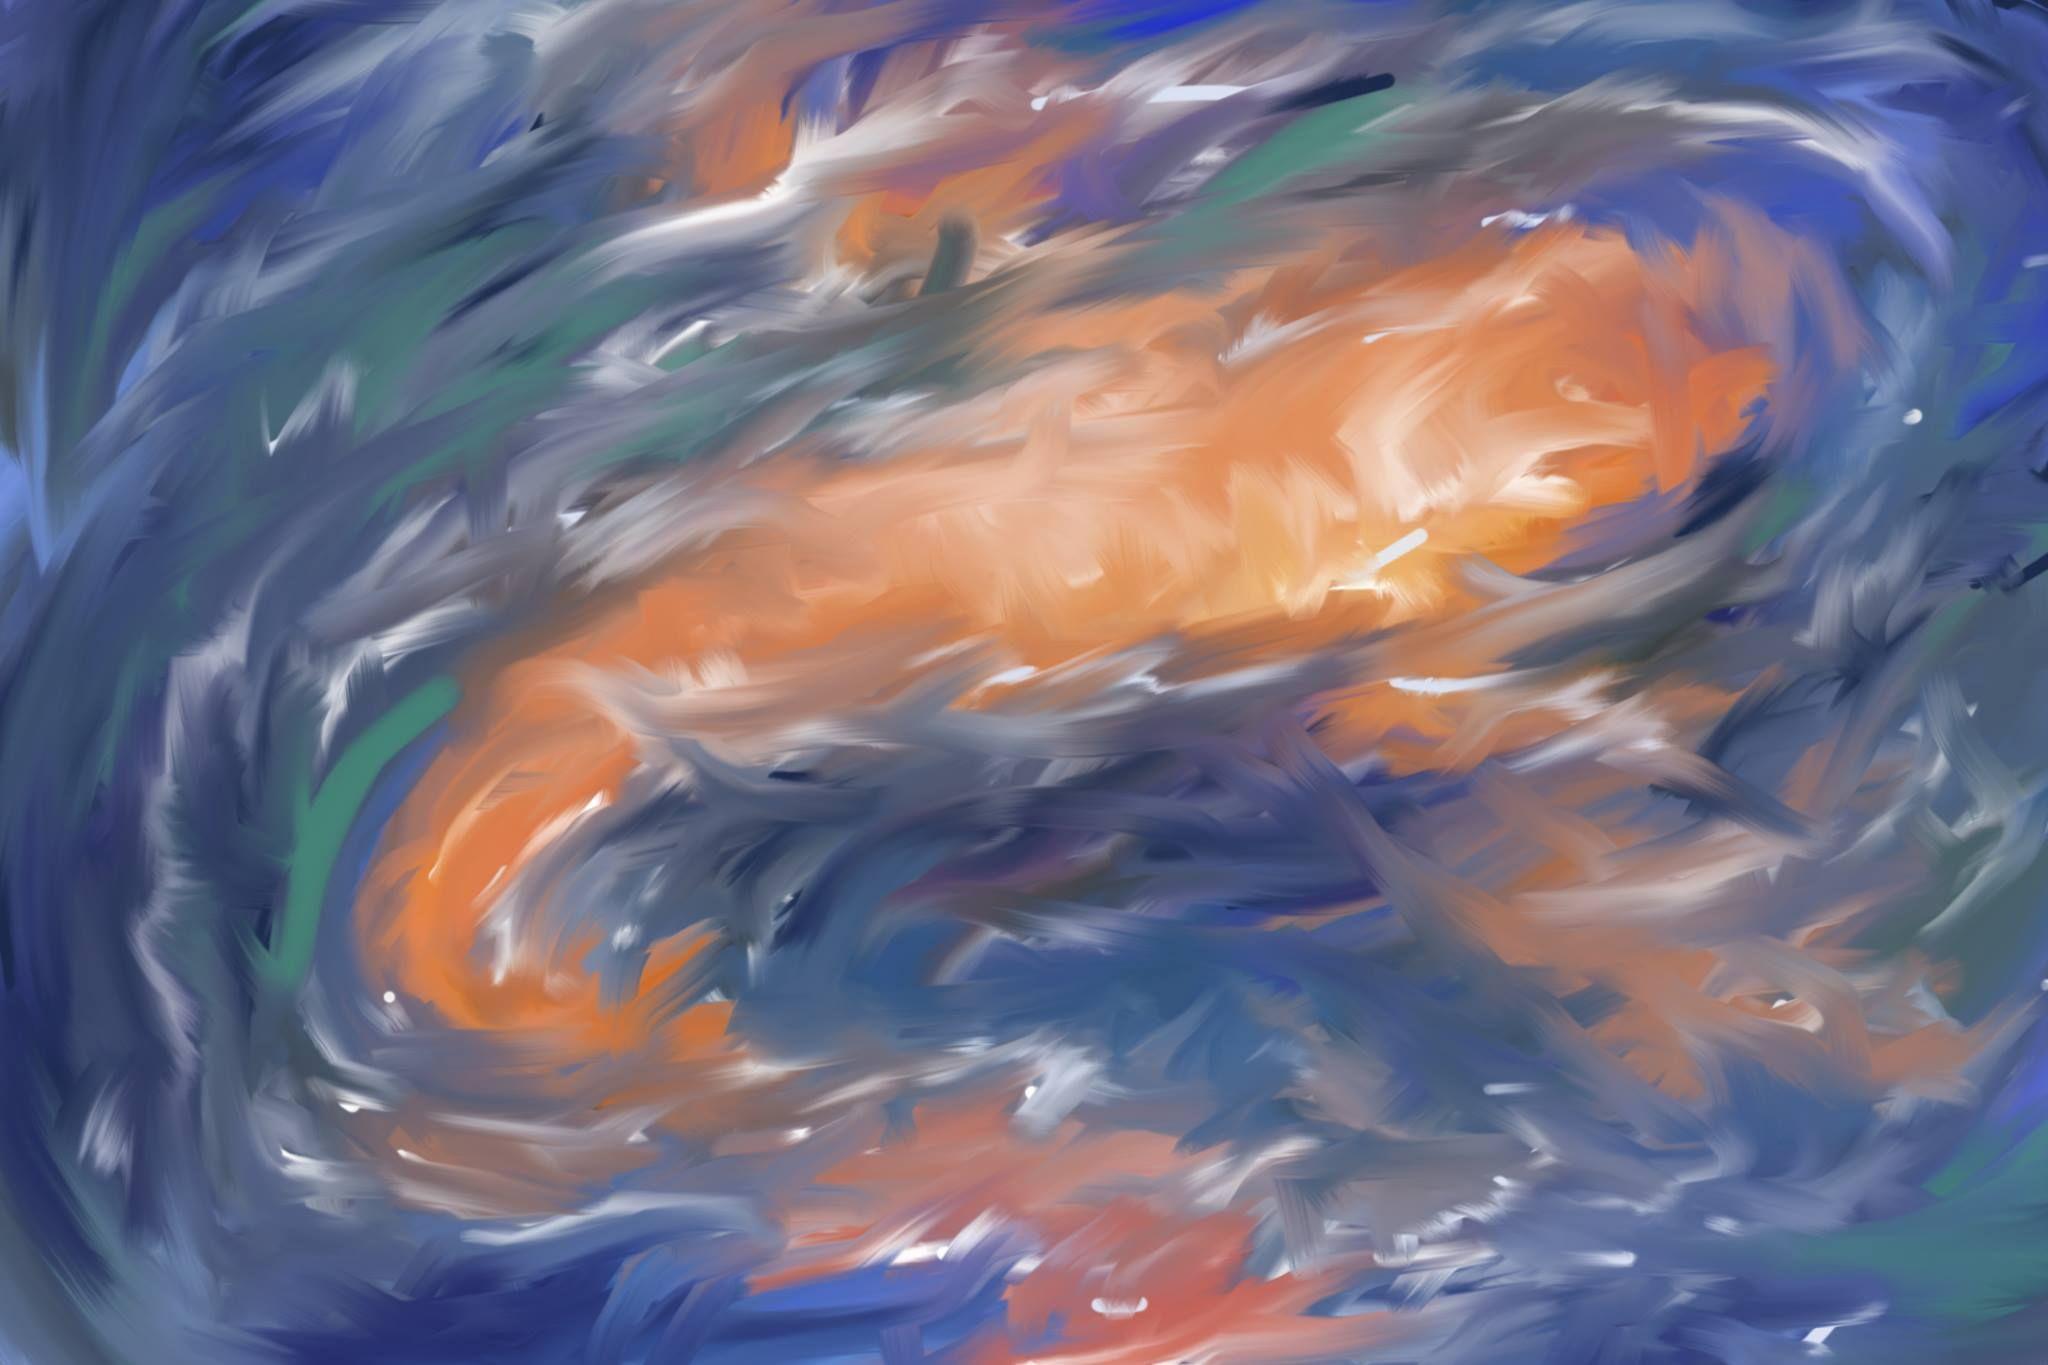 Koi Fish Digital Painting 2048 x 1365. wallpaper